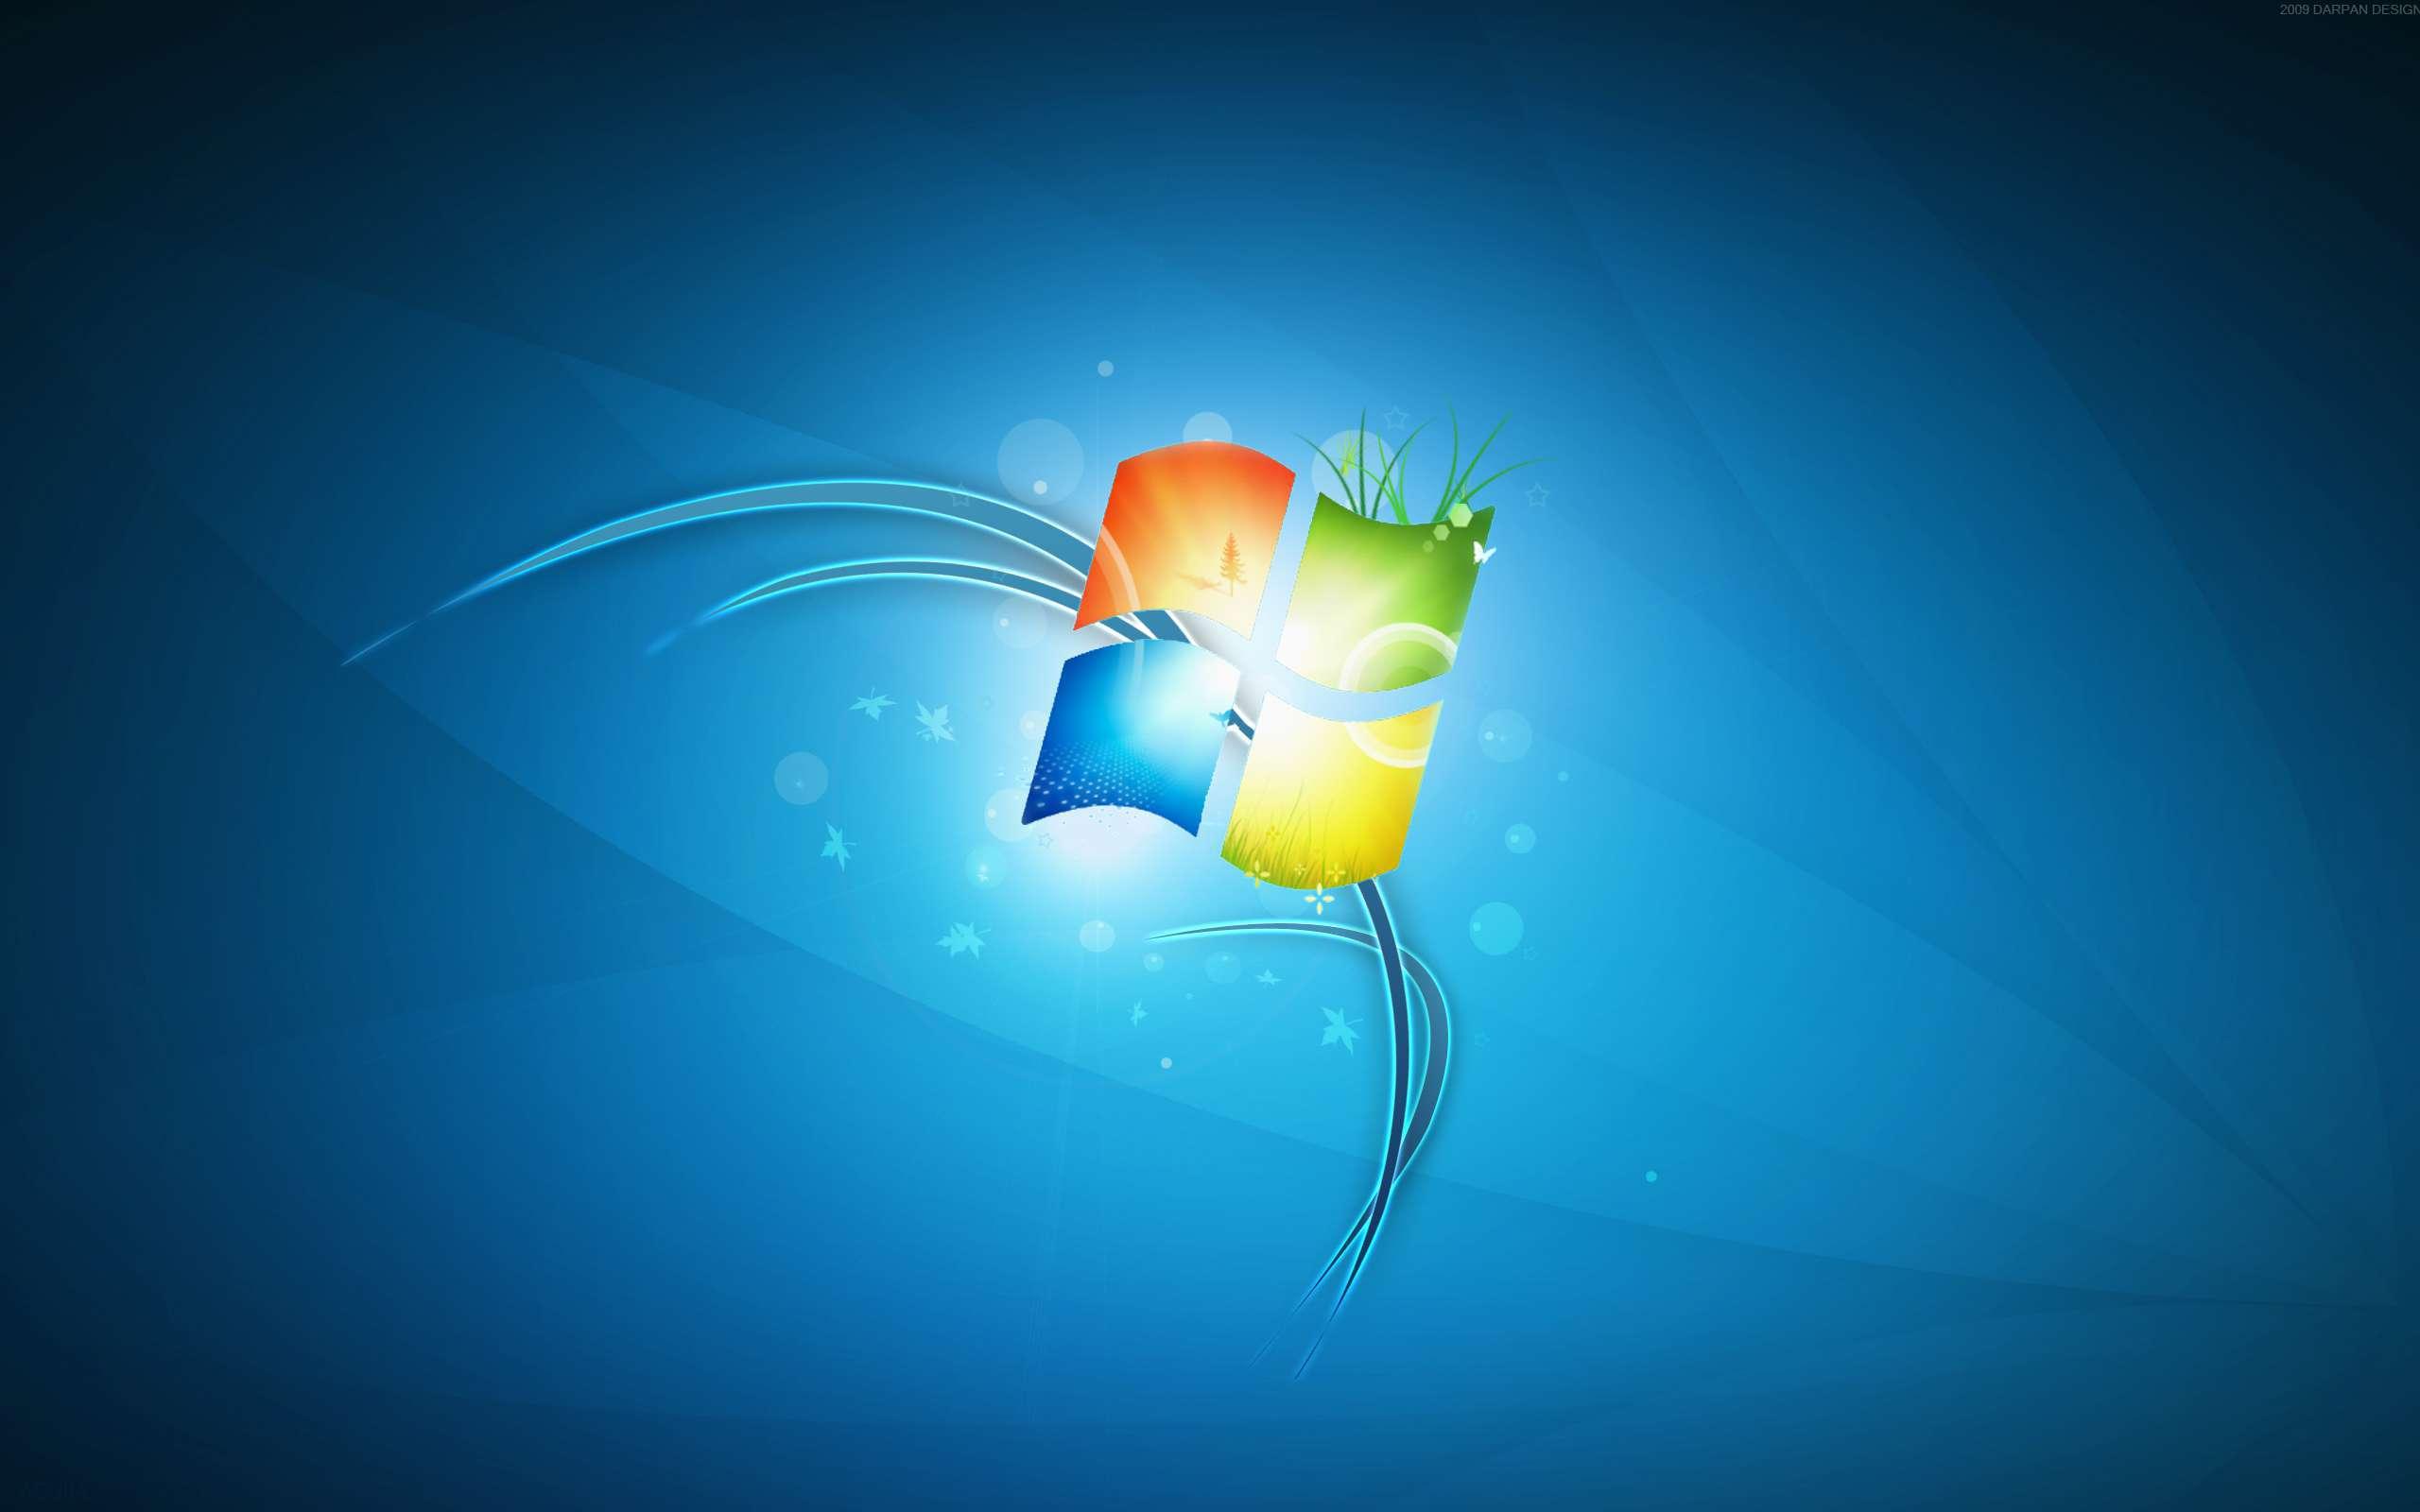 HD Wallpaper   Prashant Blog 2560x1600